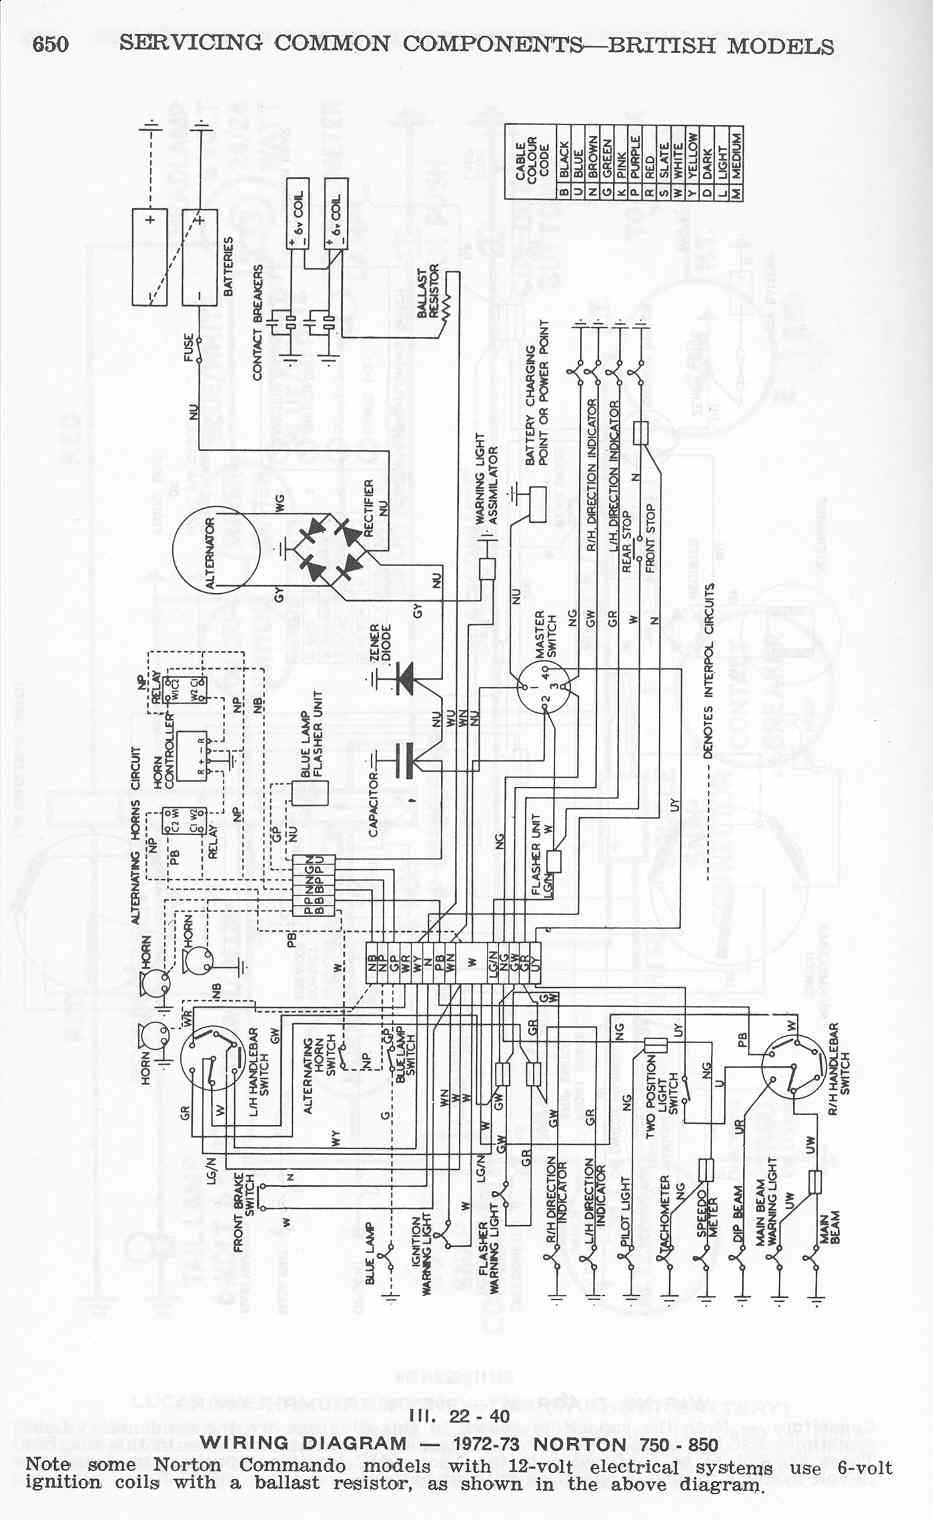 hight resolution of 1972 norton commando wiring diagram transgarp dyndns org motorcycle jpg